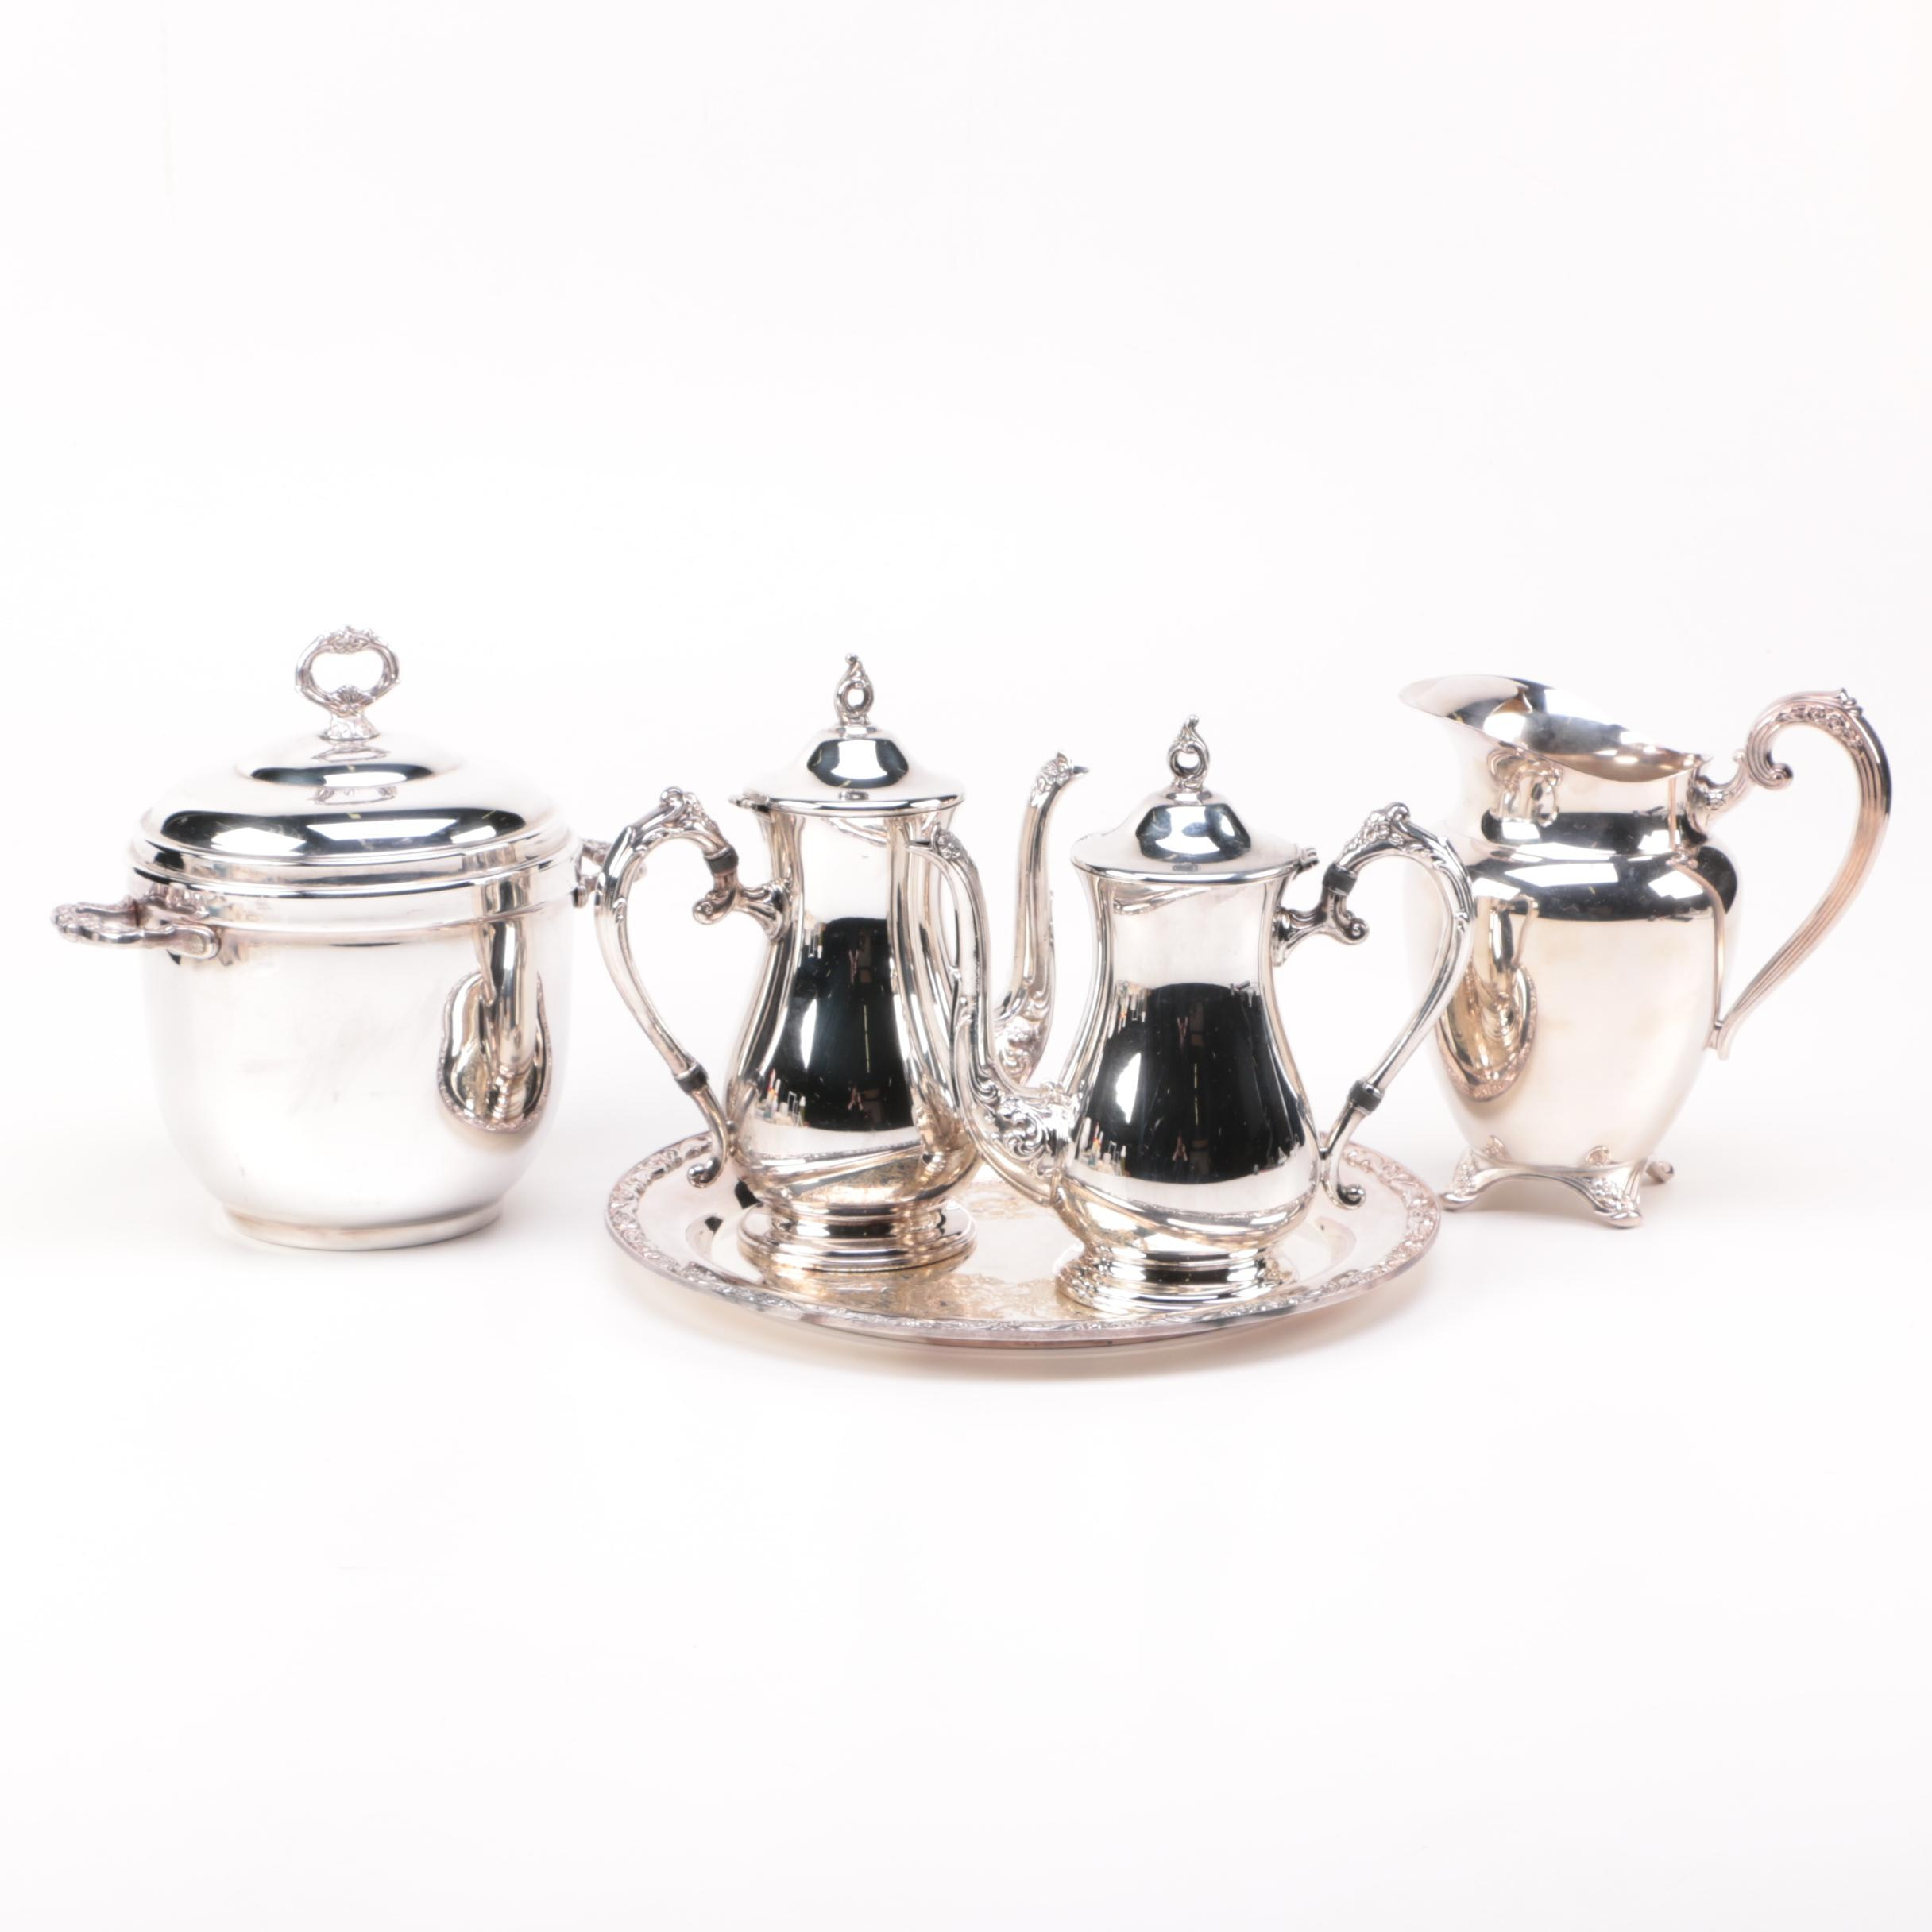 Silver Plated Servingware Including Sheridan Taunton